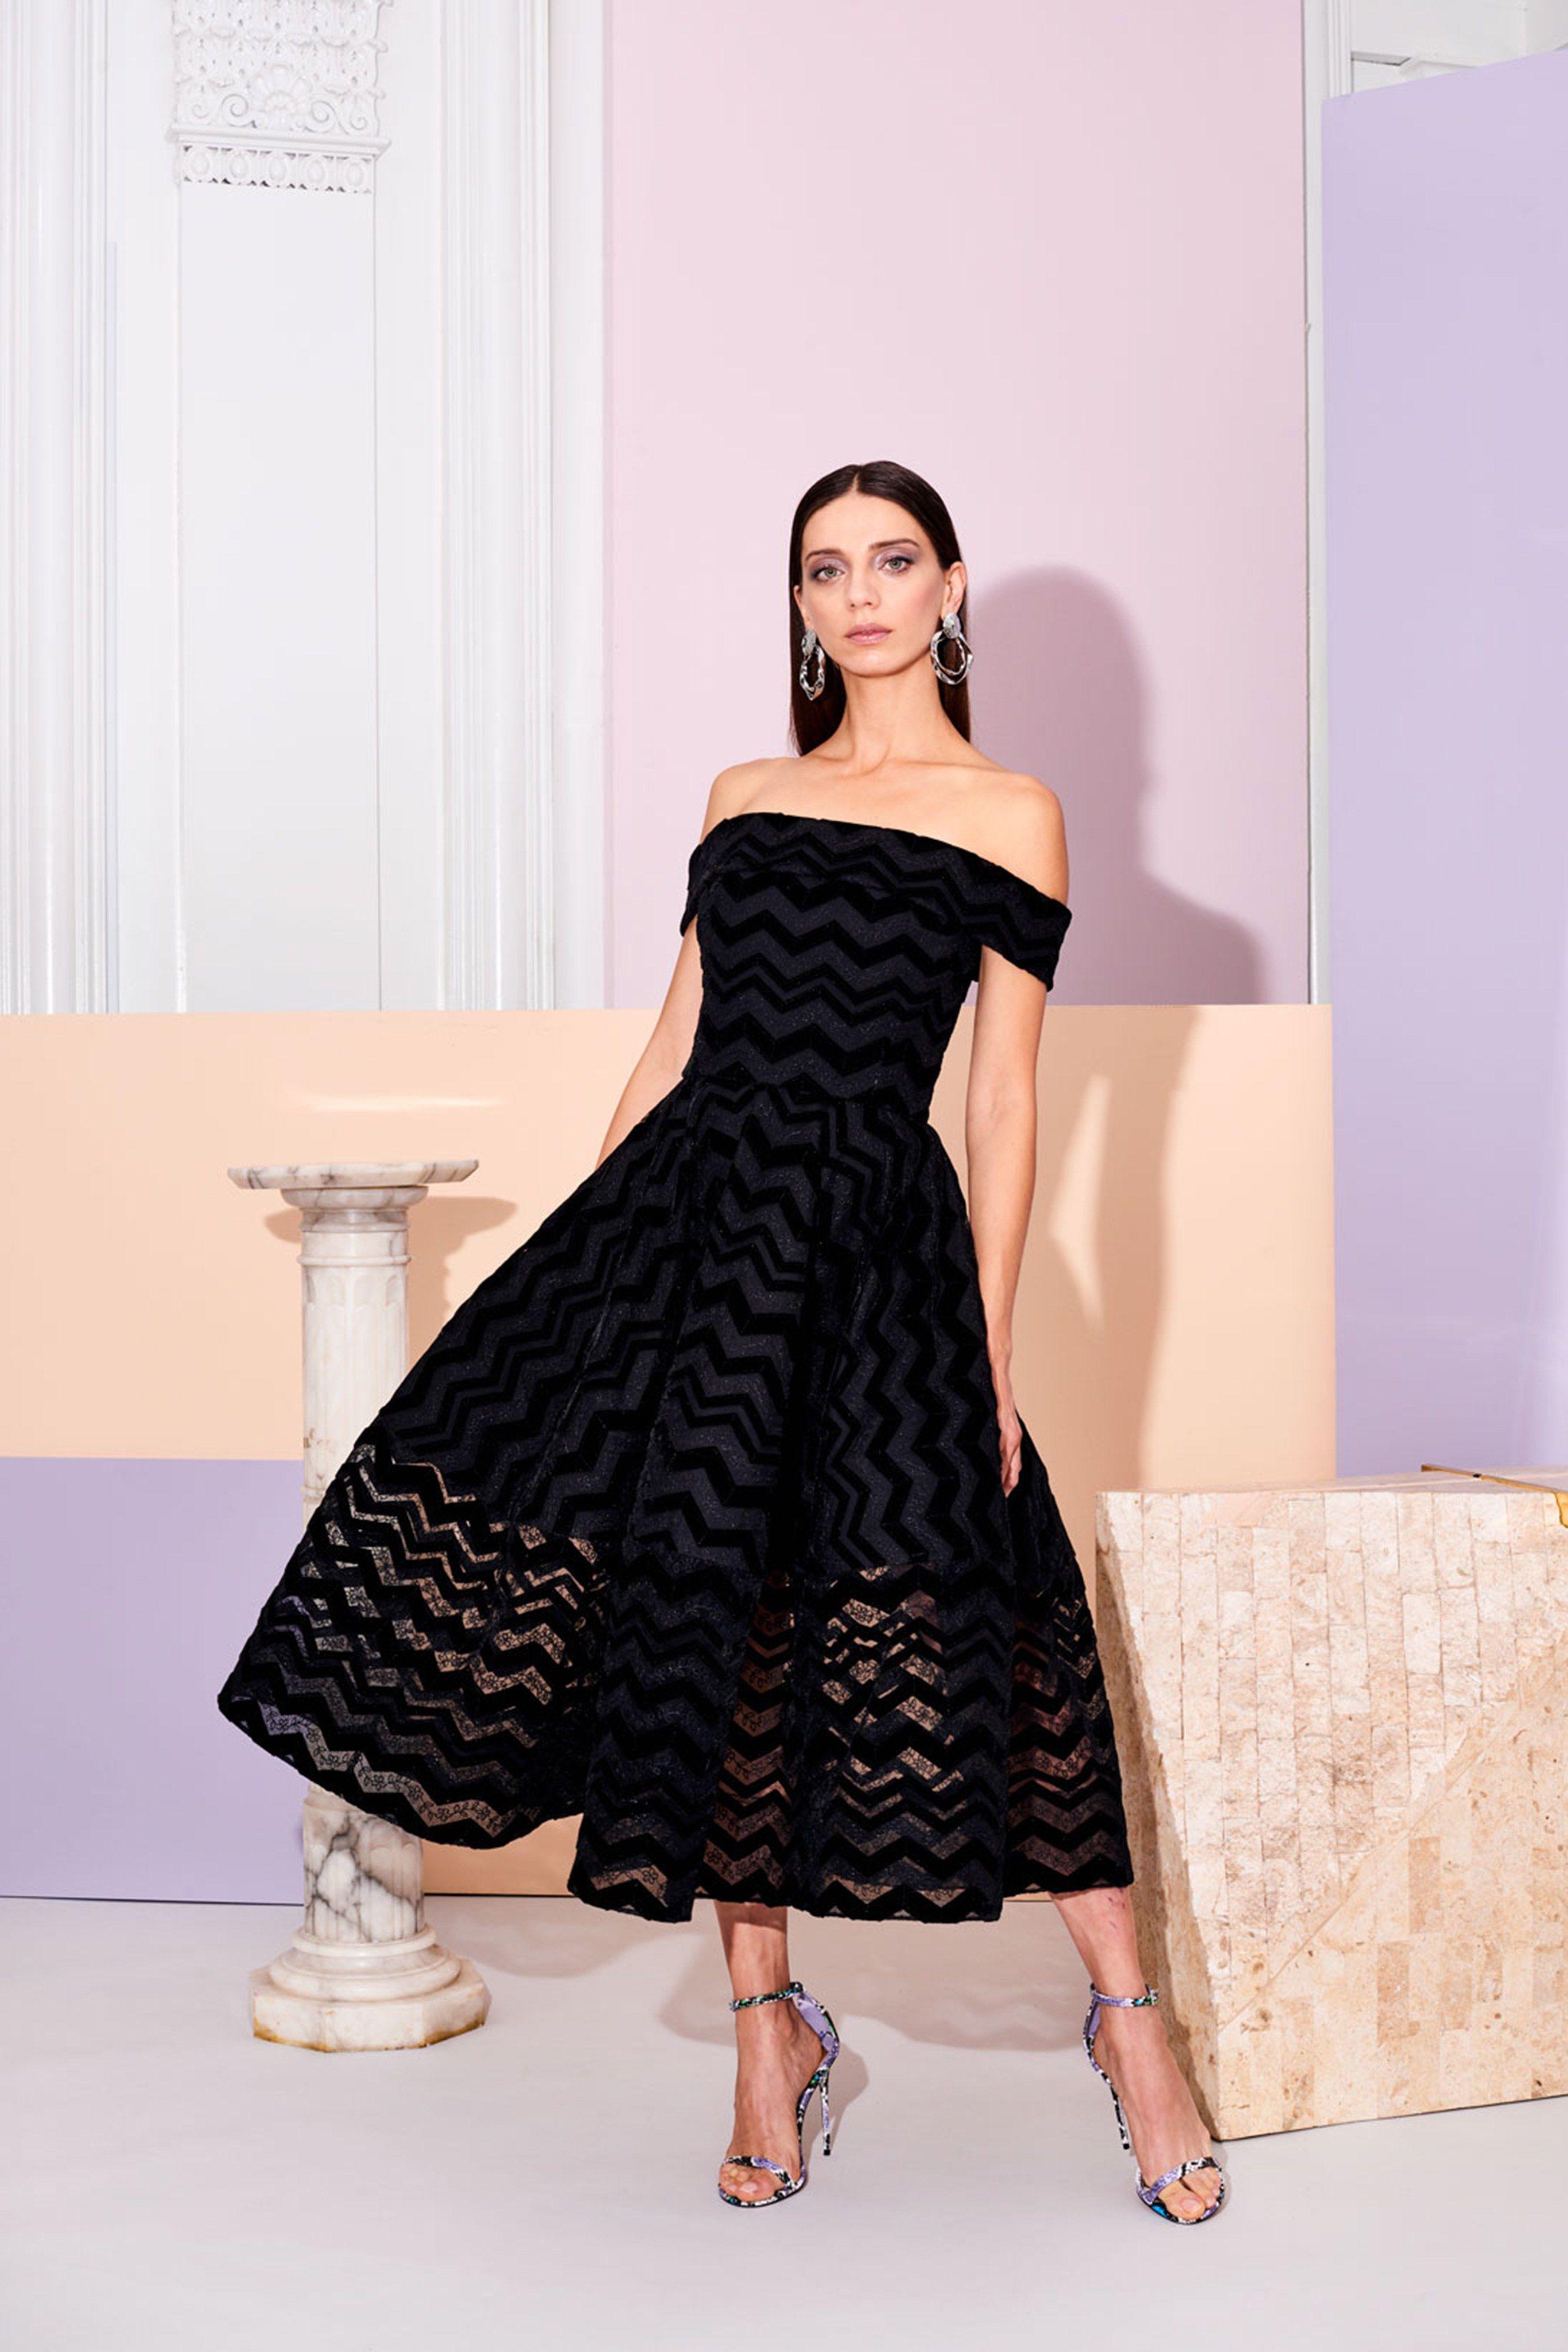 Christian Siriano Pre Fall 2019 Fashion Show Beautiful Dresses Fashion Fashion Show